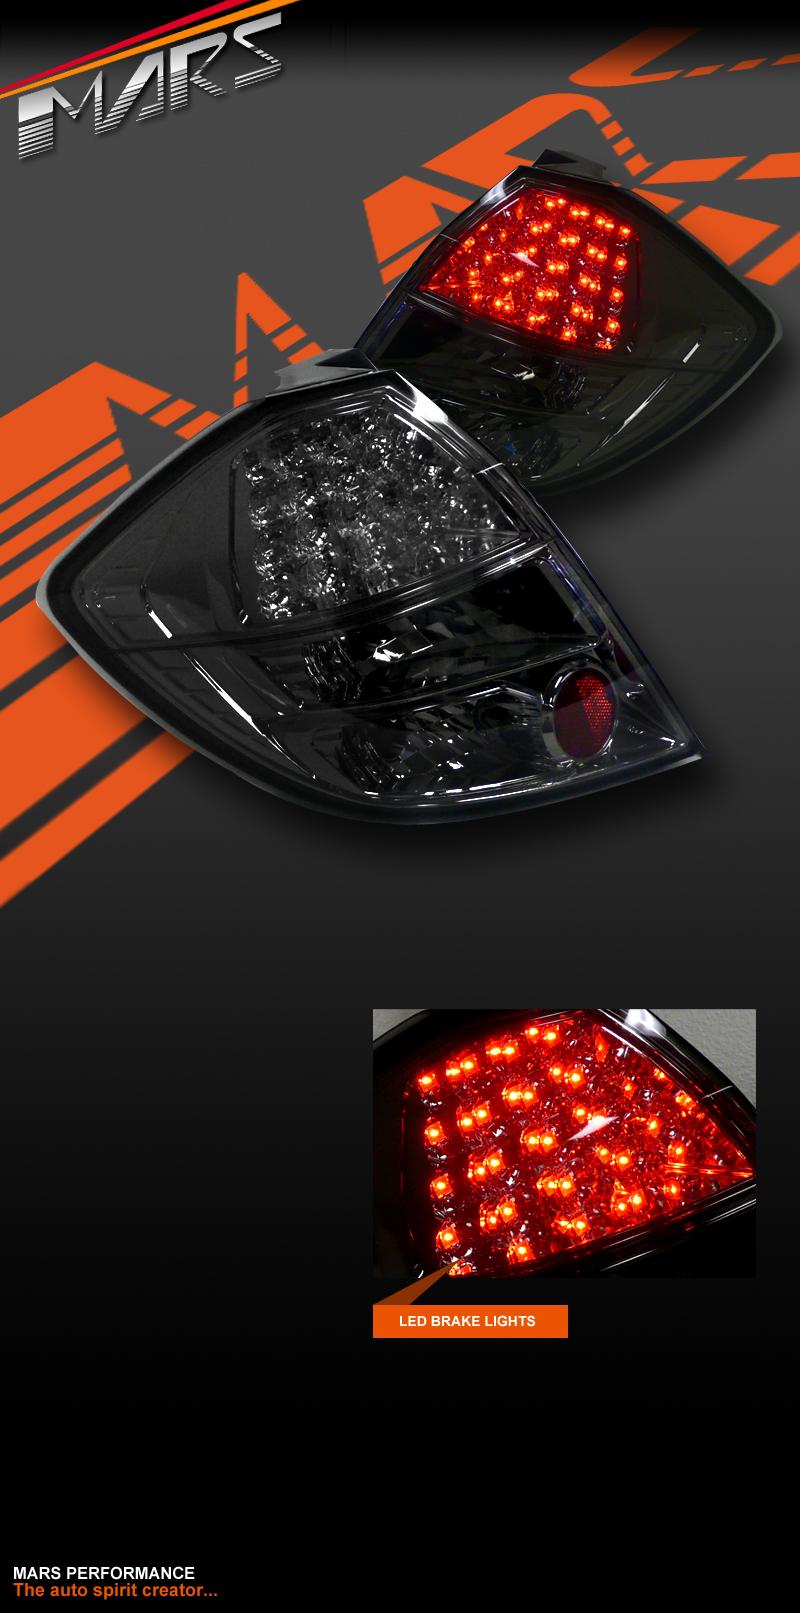 Crystal LED Taillight Tail Lights for Honda JAZZ FIT GE 08-11 VTi-S GLi Vti